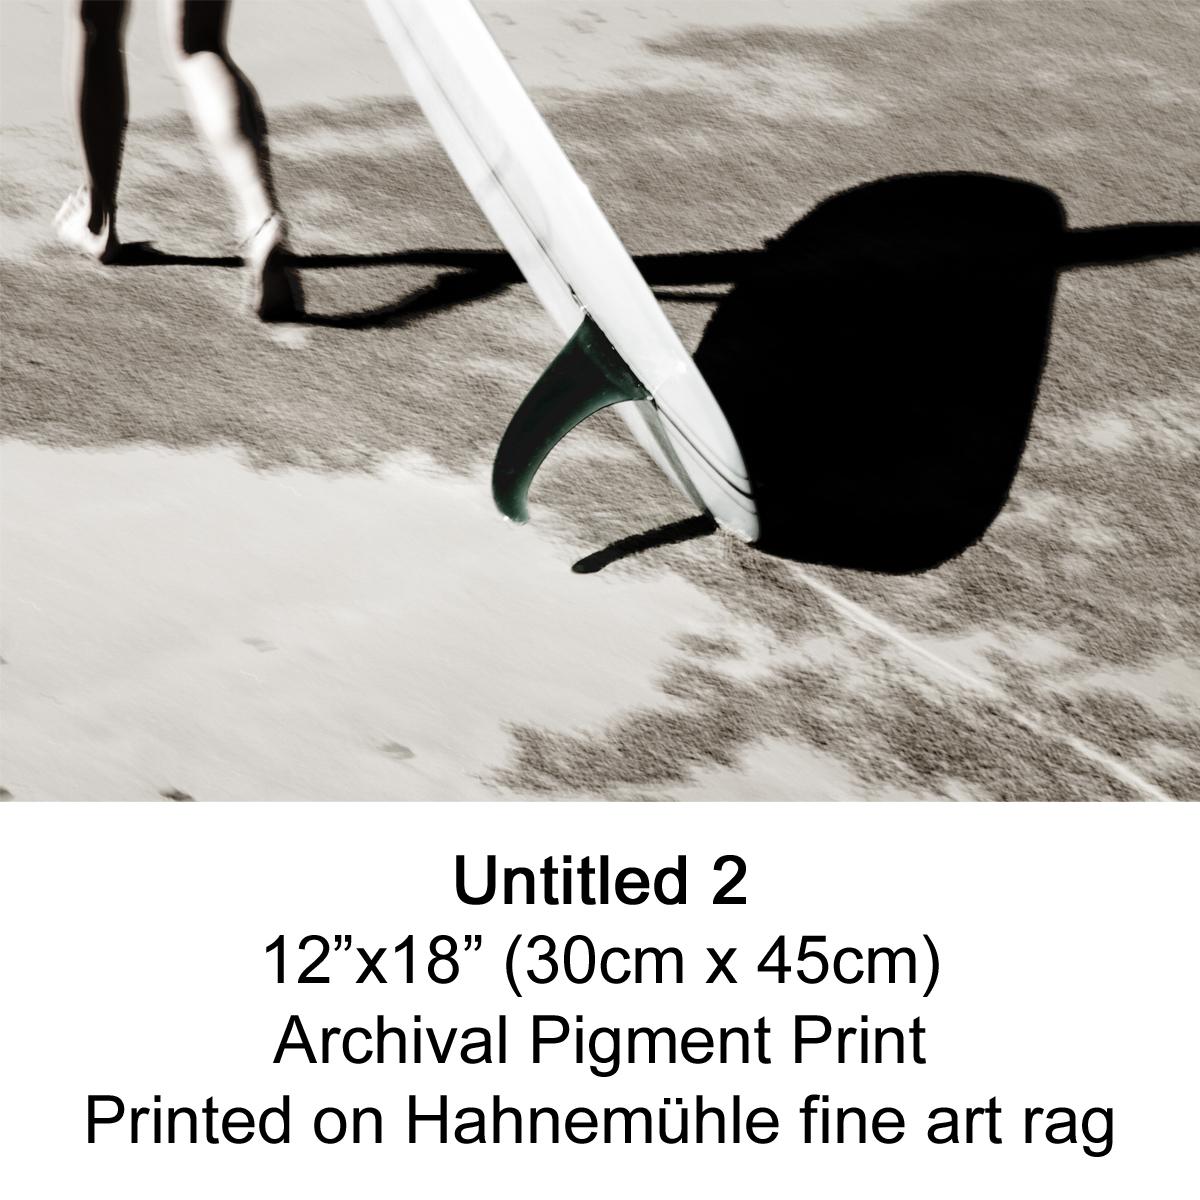 Untitled 2 by fran miller.jpg